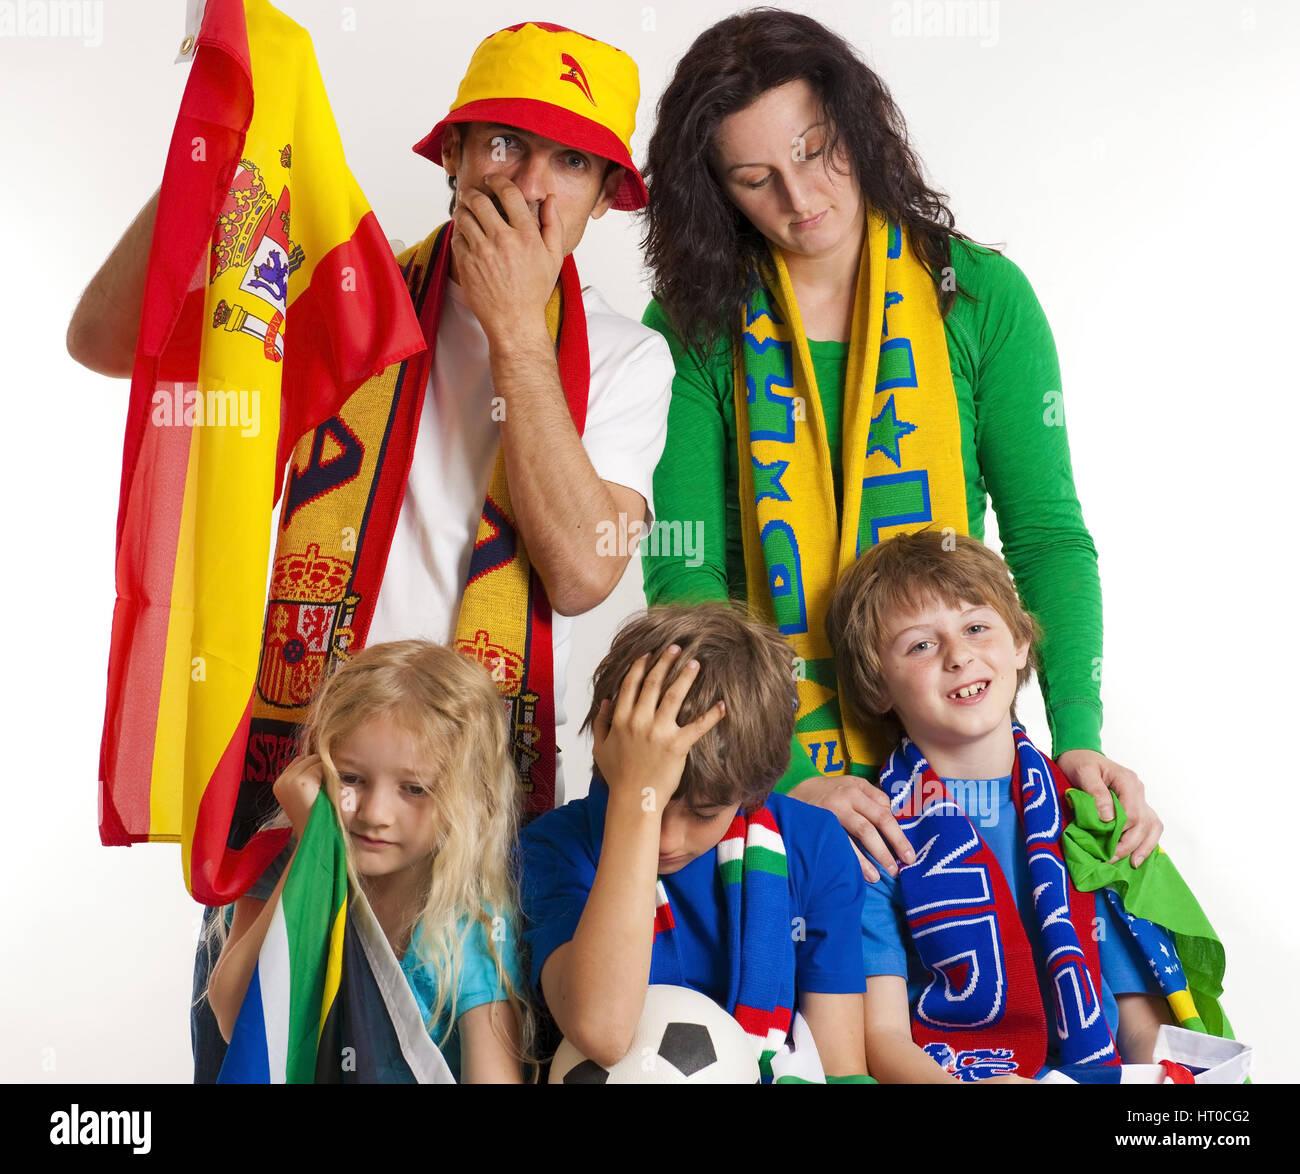 Fu?ballfans, Fu?ball-WM - soccer fans - Stock Image